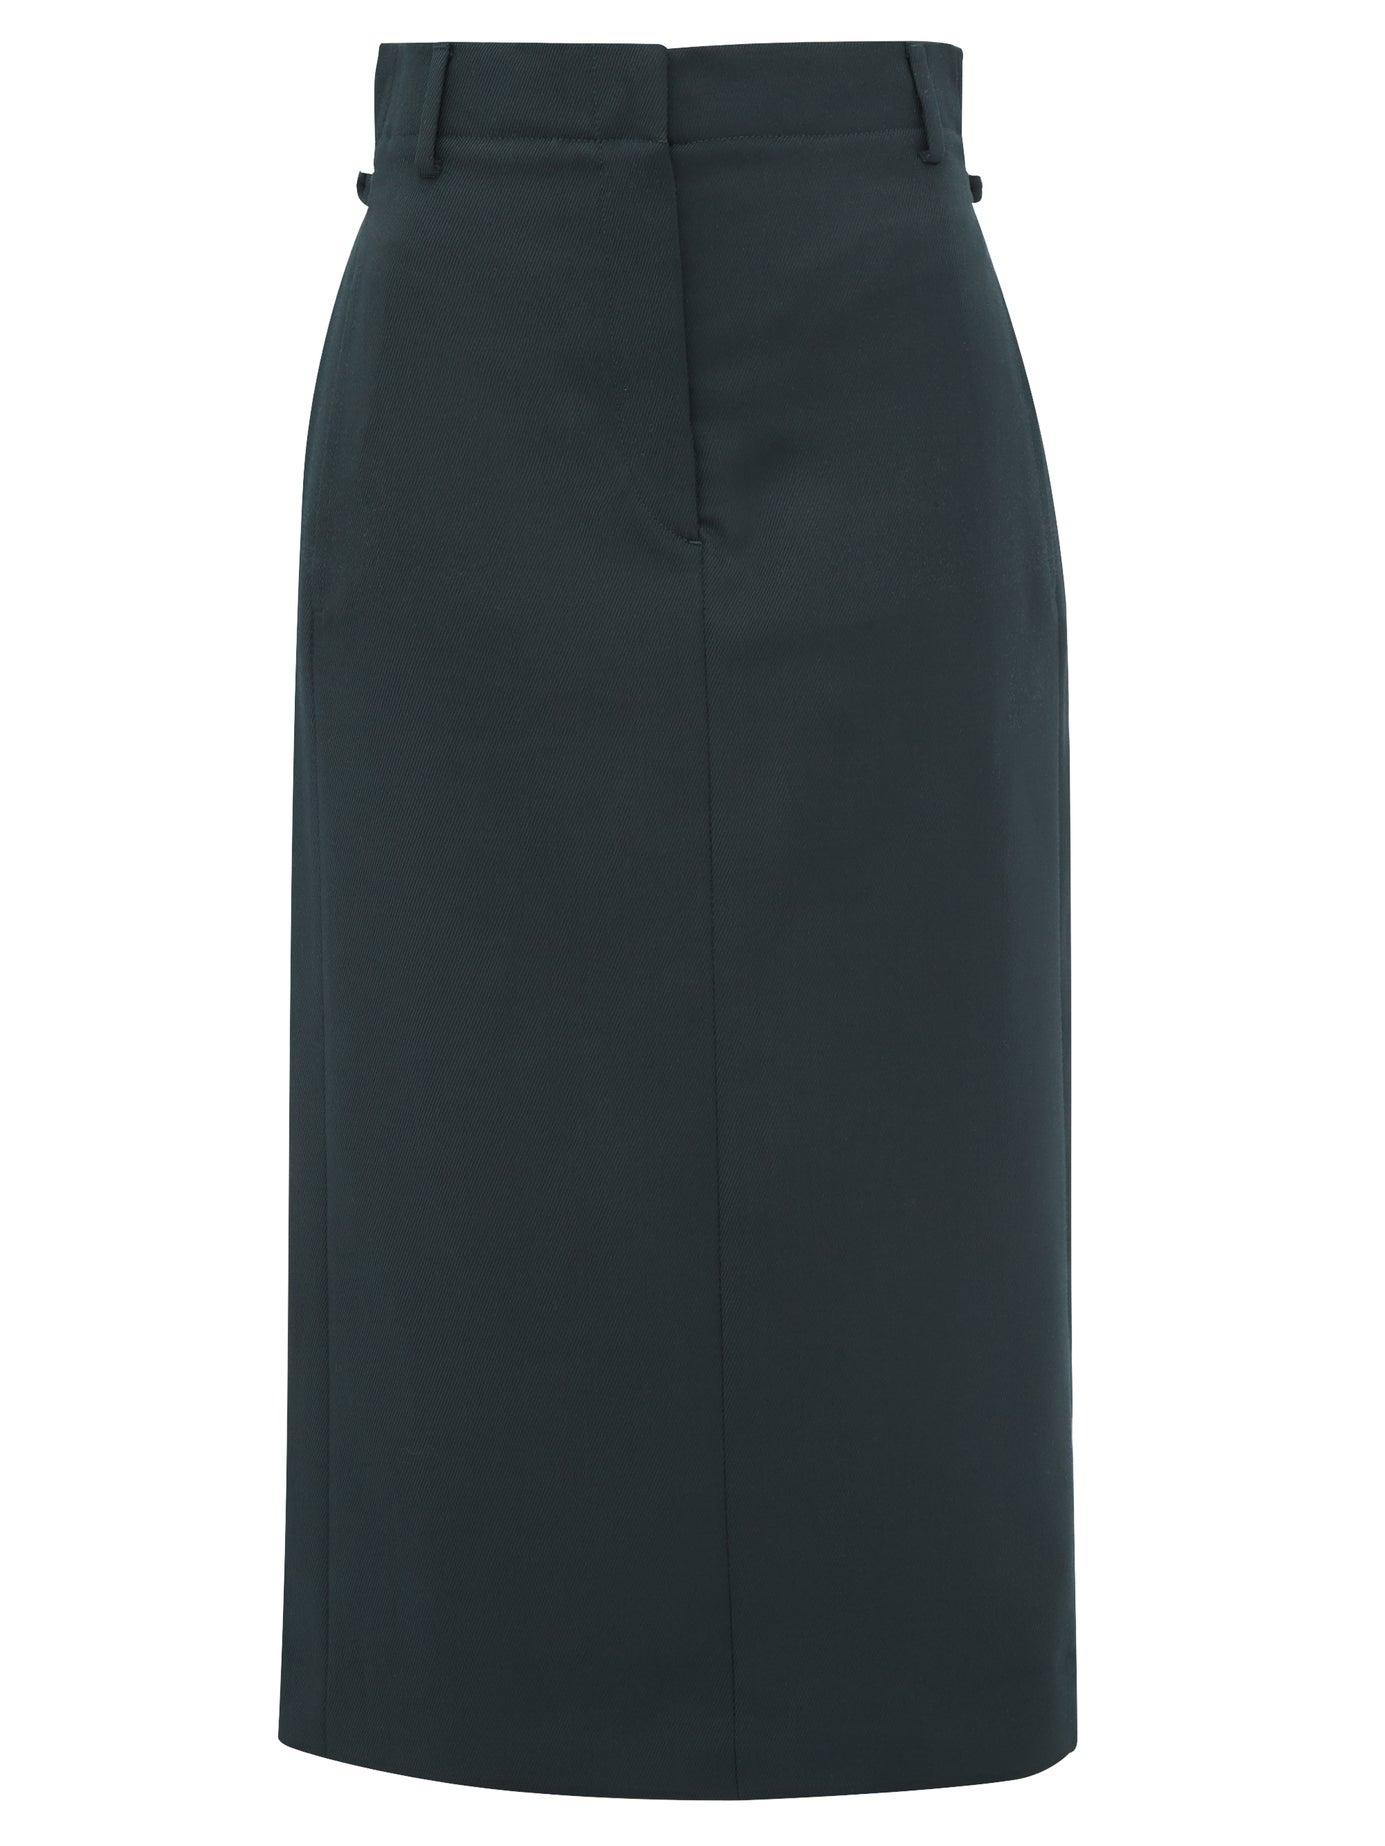 Image of ACNE STUDIOS Ixandra Twill Suit Fn-wn-skir000117, Deep Green